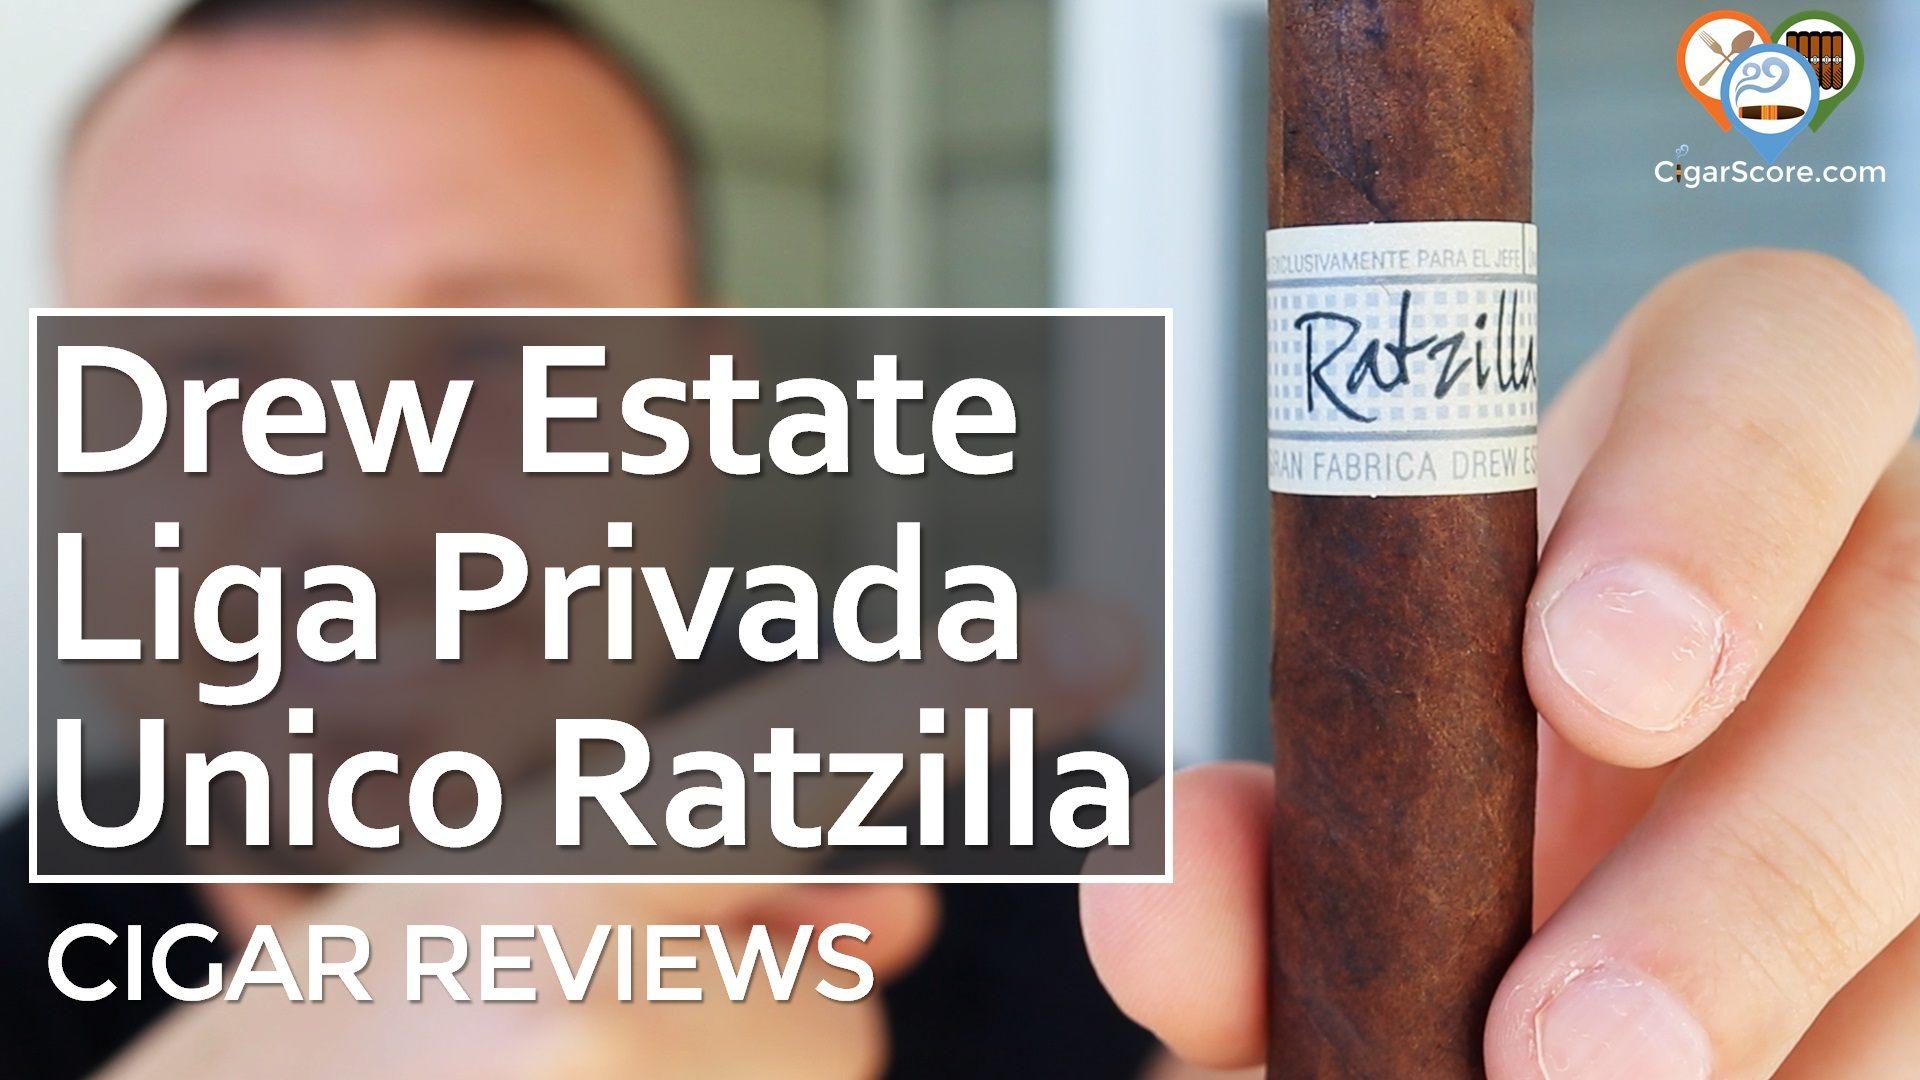 Cigar Review Drew Estate Liga Privada Unico Serie Ratzilla